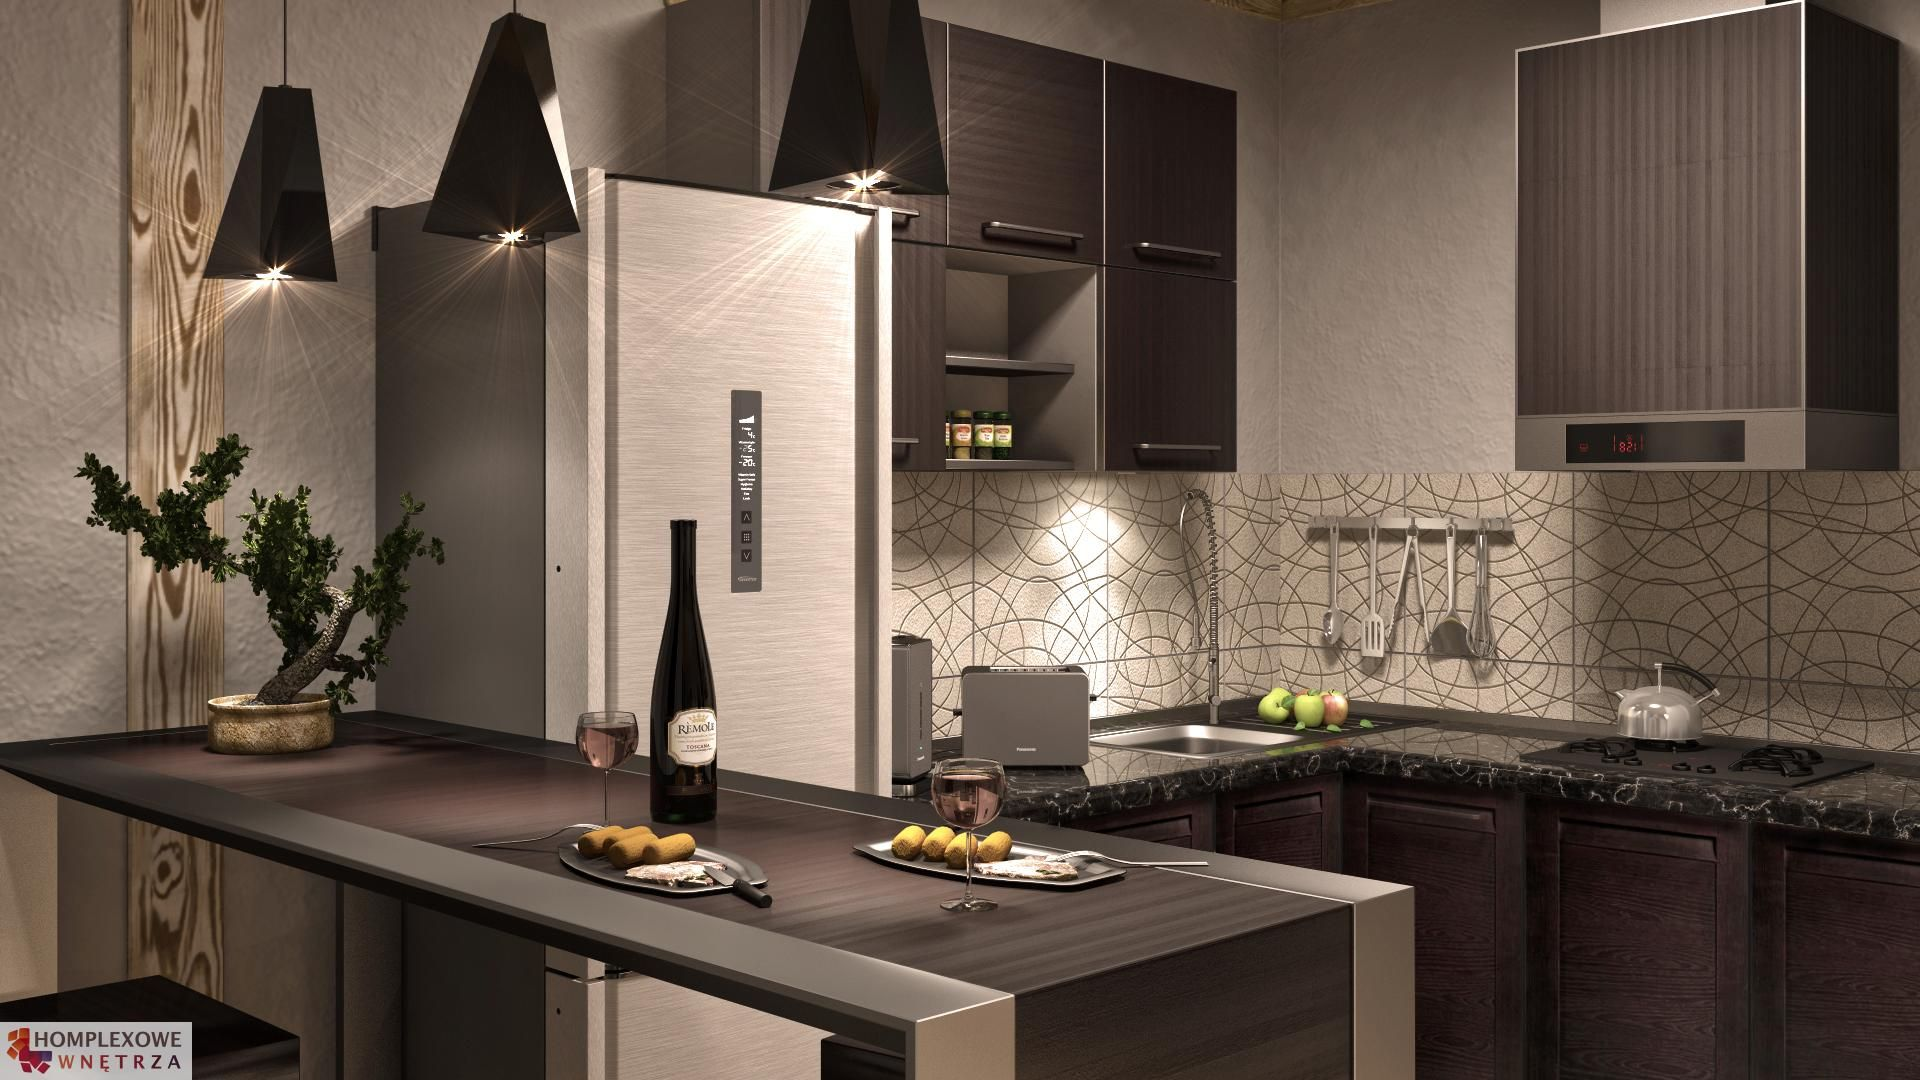 Kuchnia Concepthouse Mokotow Rozklad Lokalu Nr 133 142 145 Autorzy Projektu Djordje Stevanovic I Bogoljub Stankovic Kitchen Interior Kitchen Home Decor